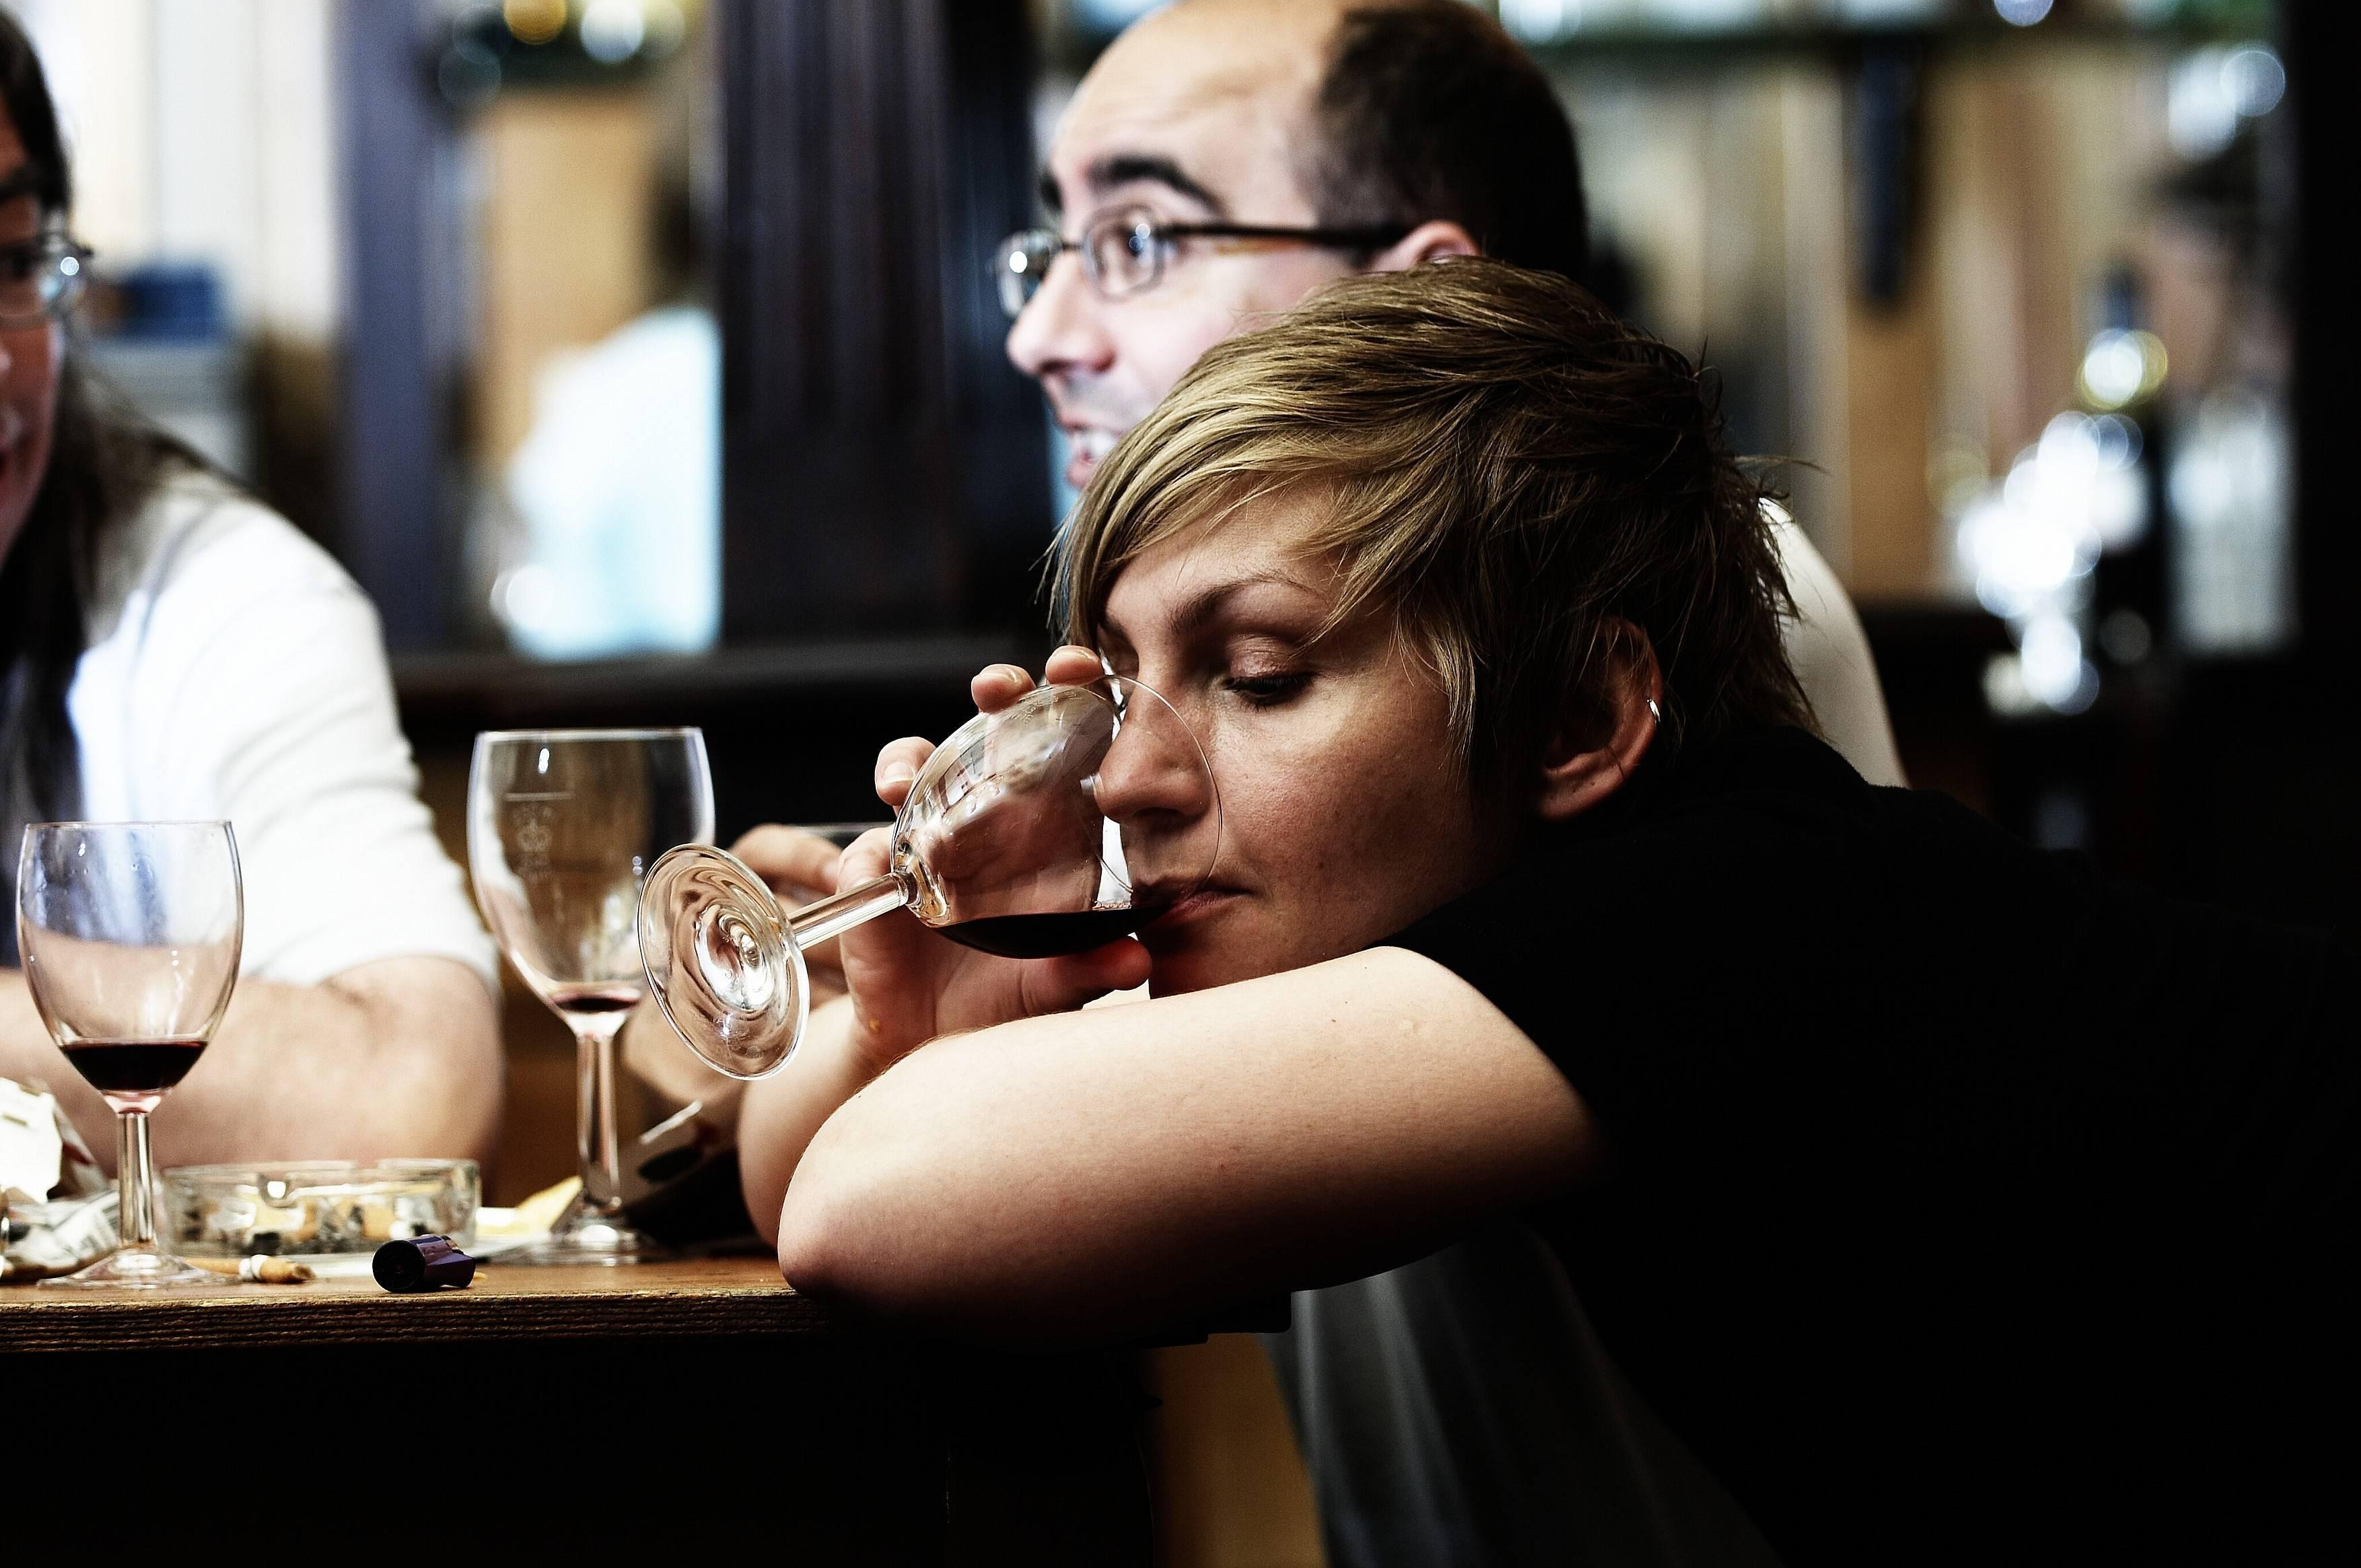 Почему неизлечим женский алкоголизм?